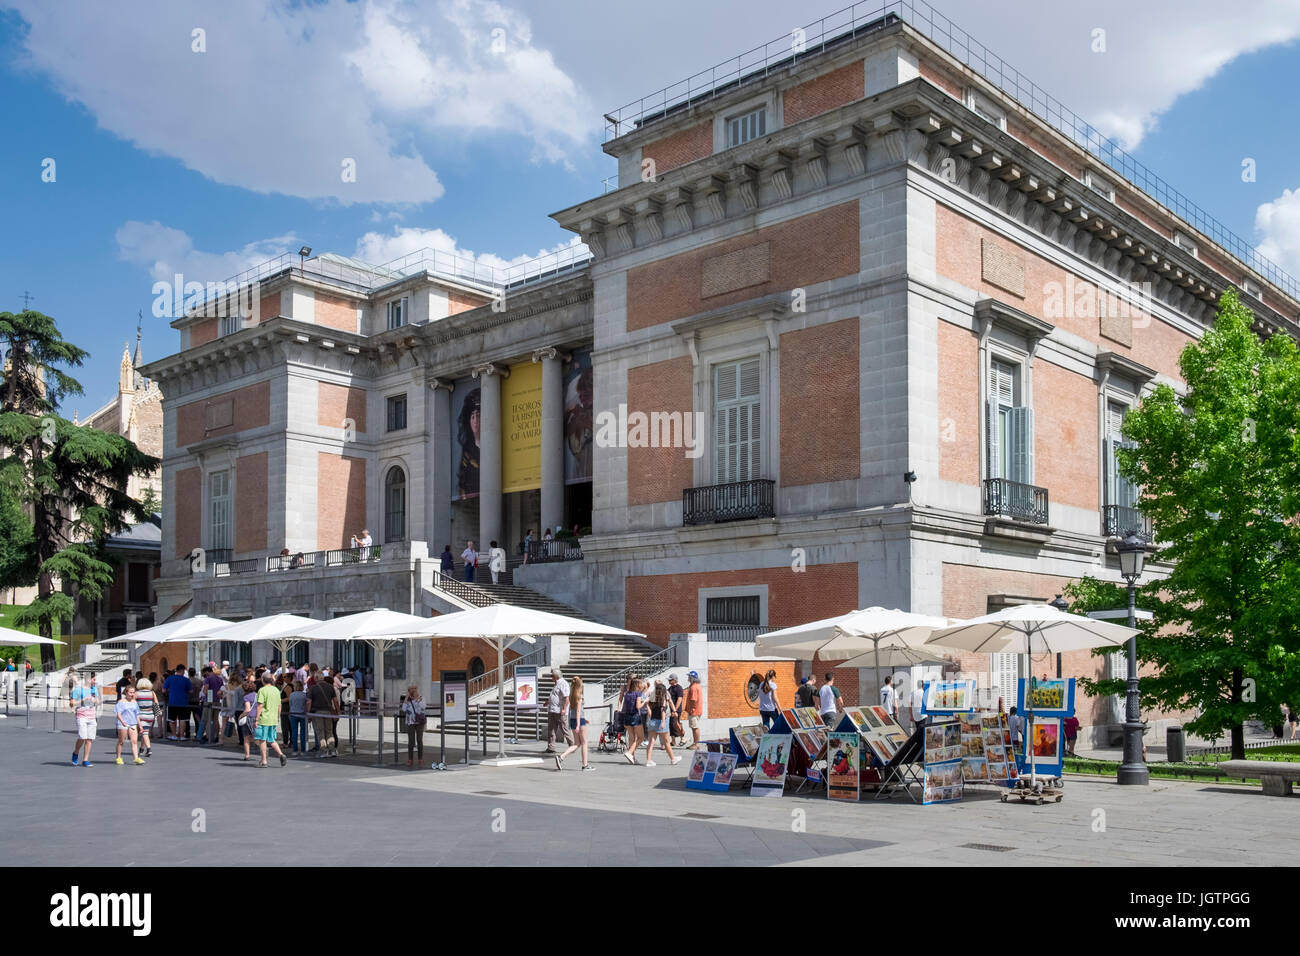 Tourists outside the Prado Museum building entrance, Madrid, Spain - Stock Image